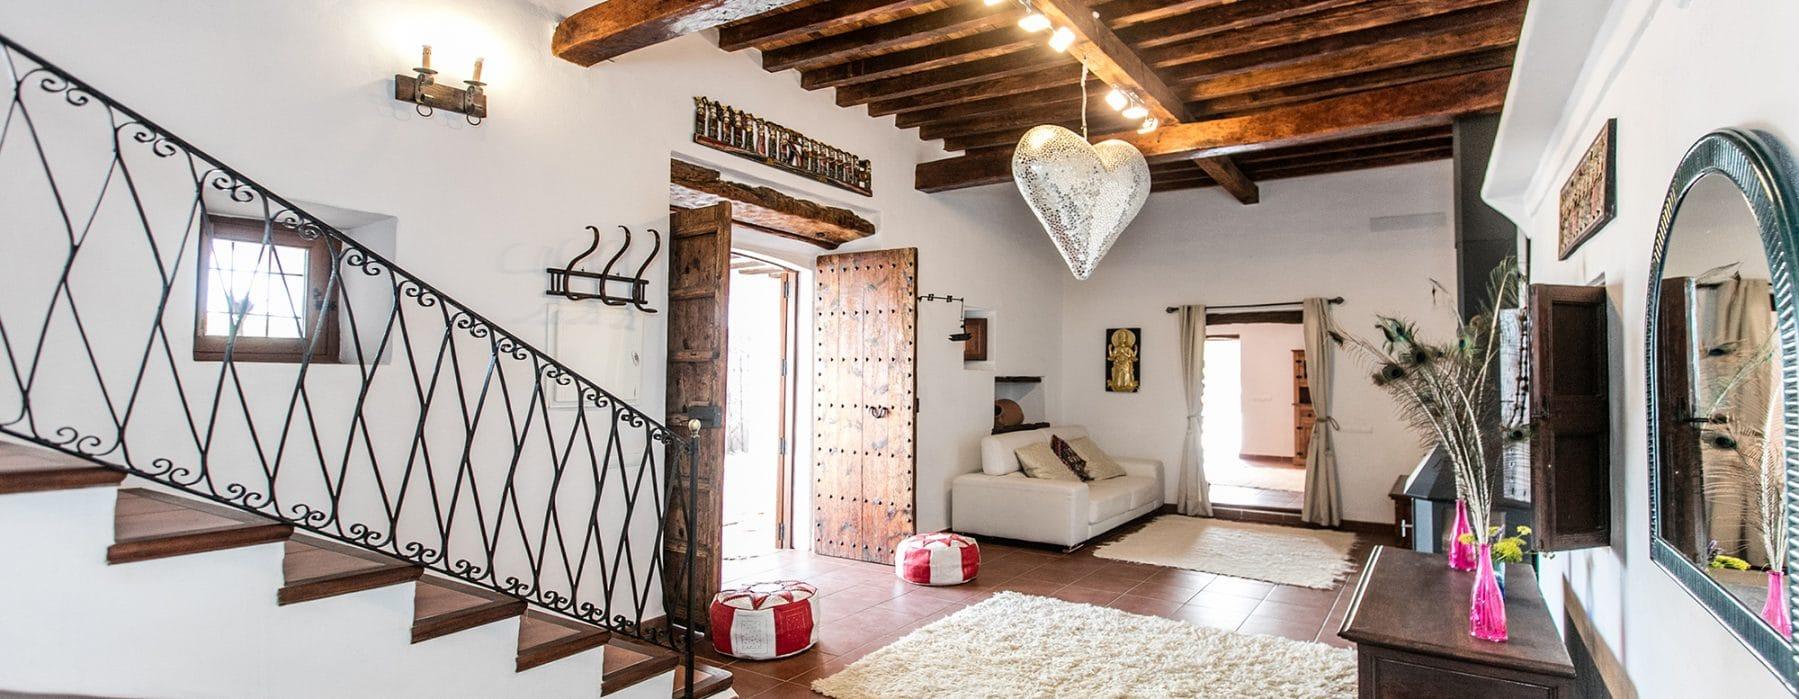 Villa Can Skye Love - Ibiza Selected